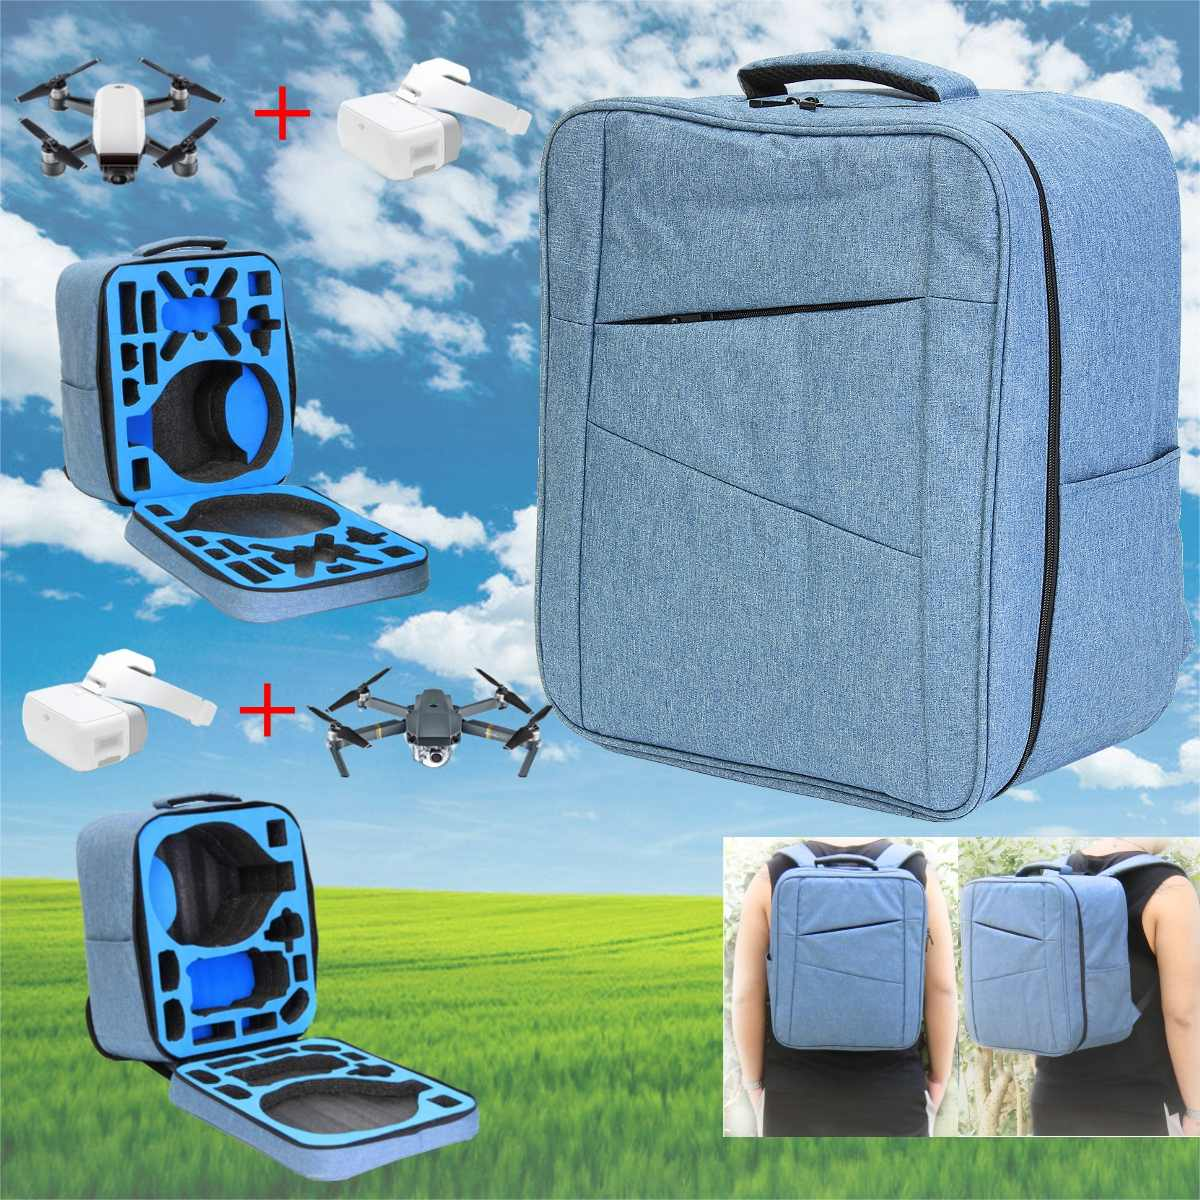 Sac à dos Portable couleur bleu océan pour DJI spark DJI mavic pro Drone sacs accessoires